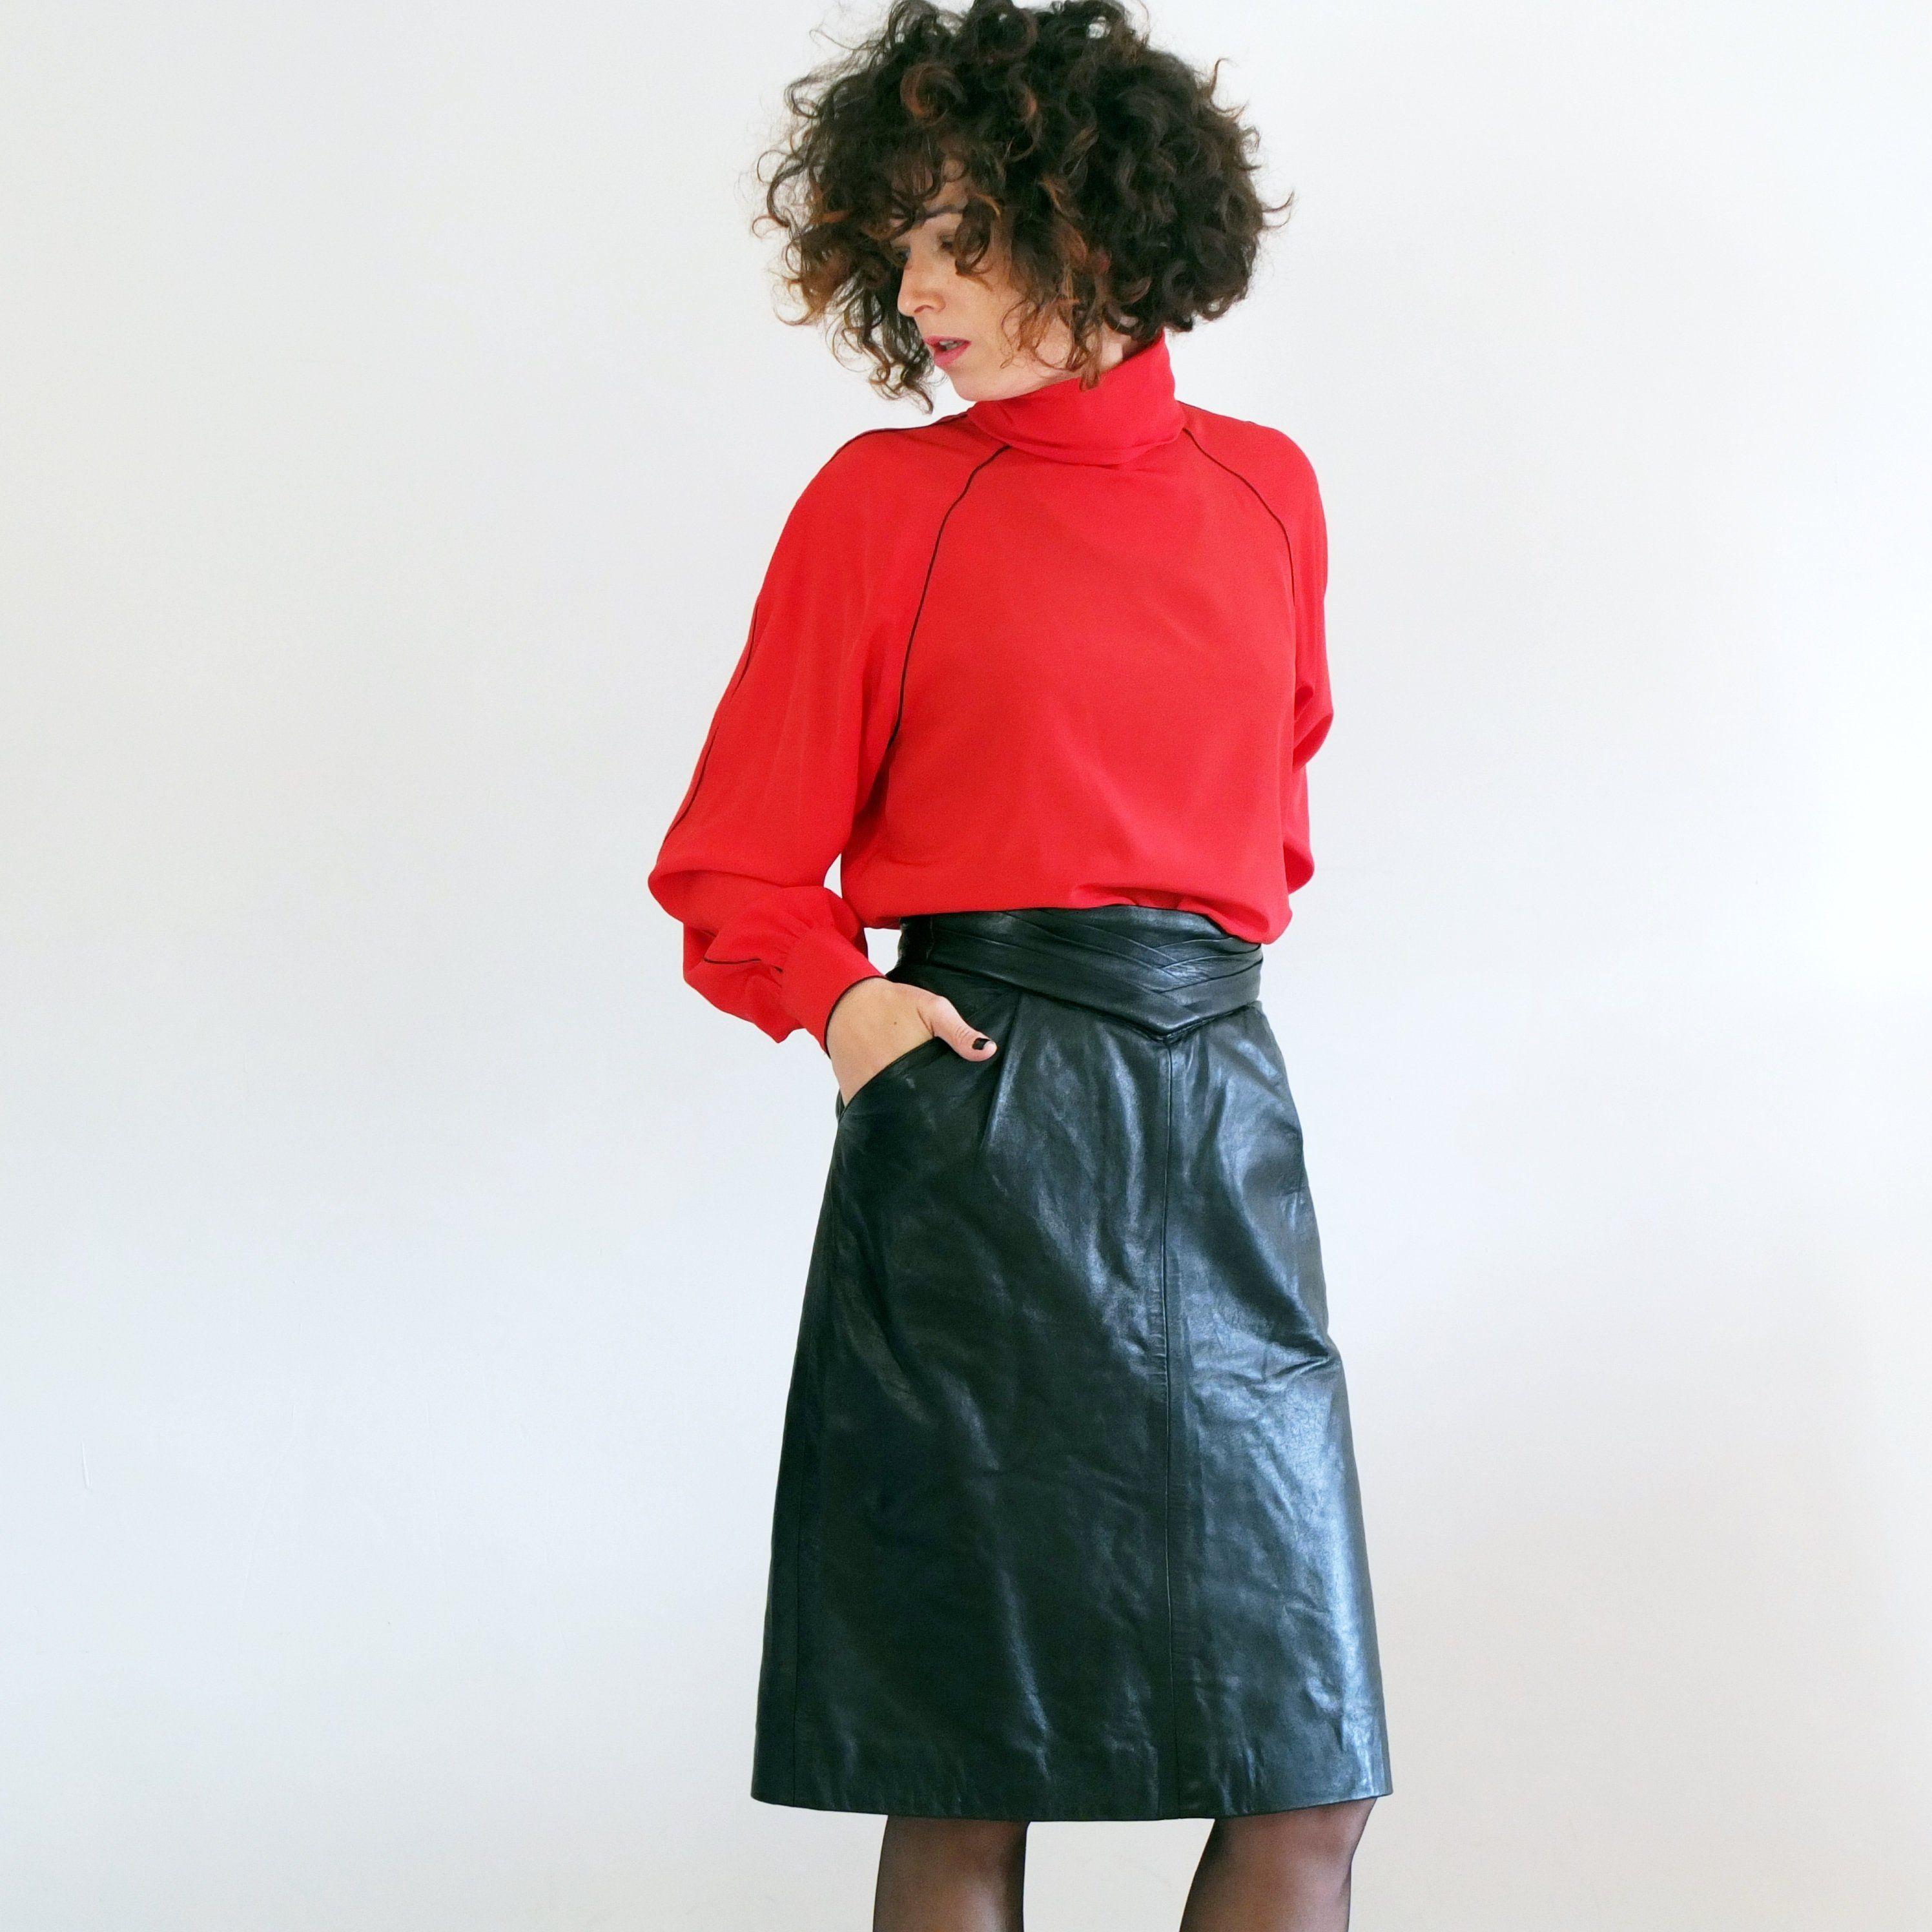 a0d5dc1a77 Vintage 80s high waisted leather skirt, black wiggle leather skirt, knee  length leather skirt